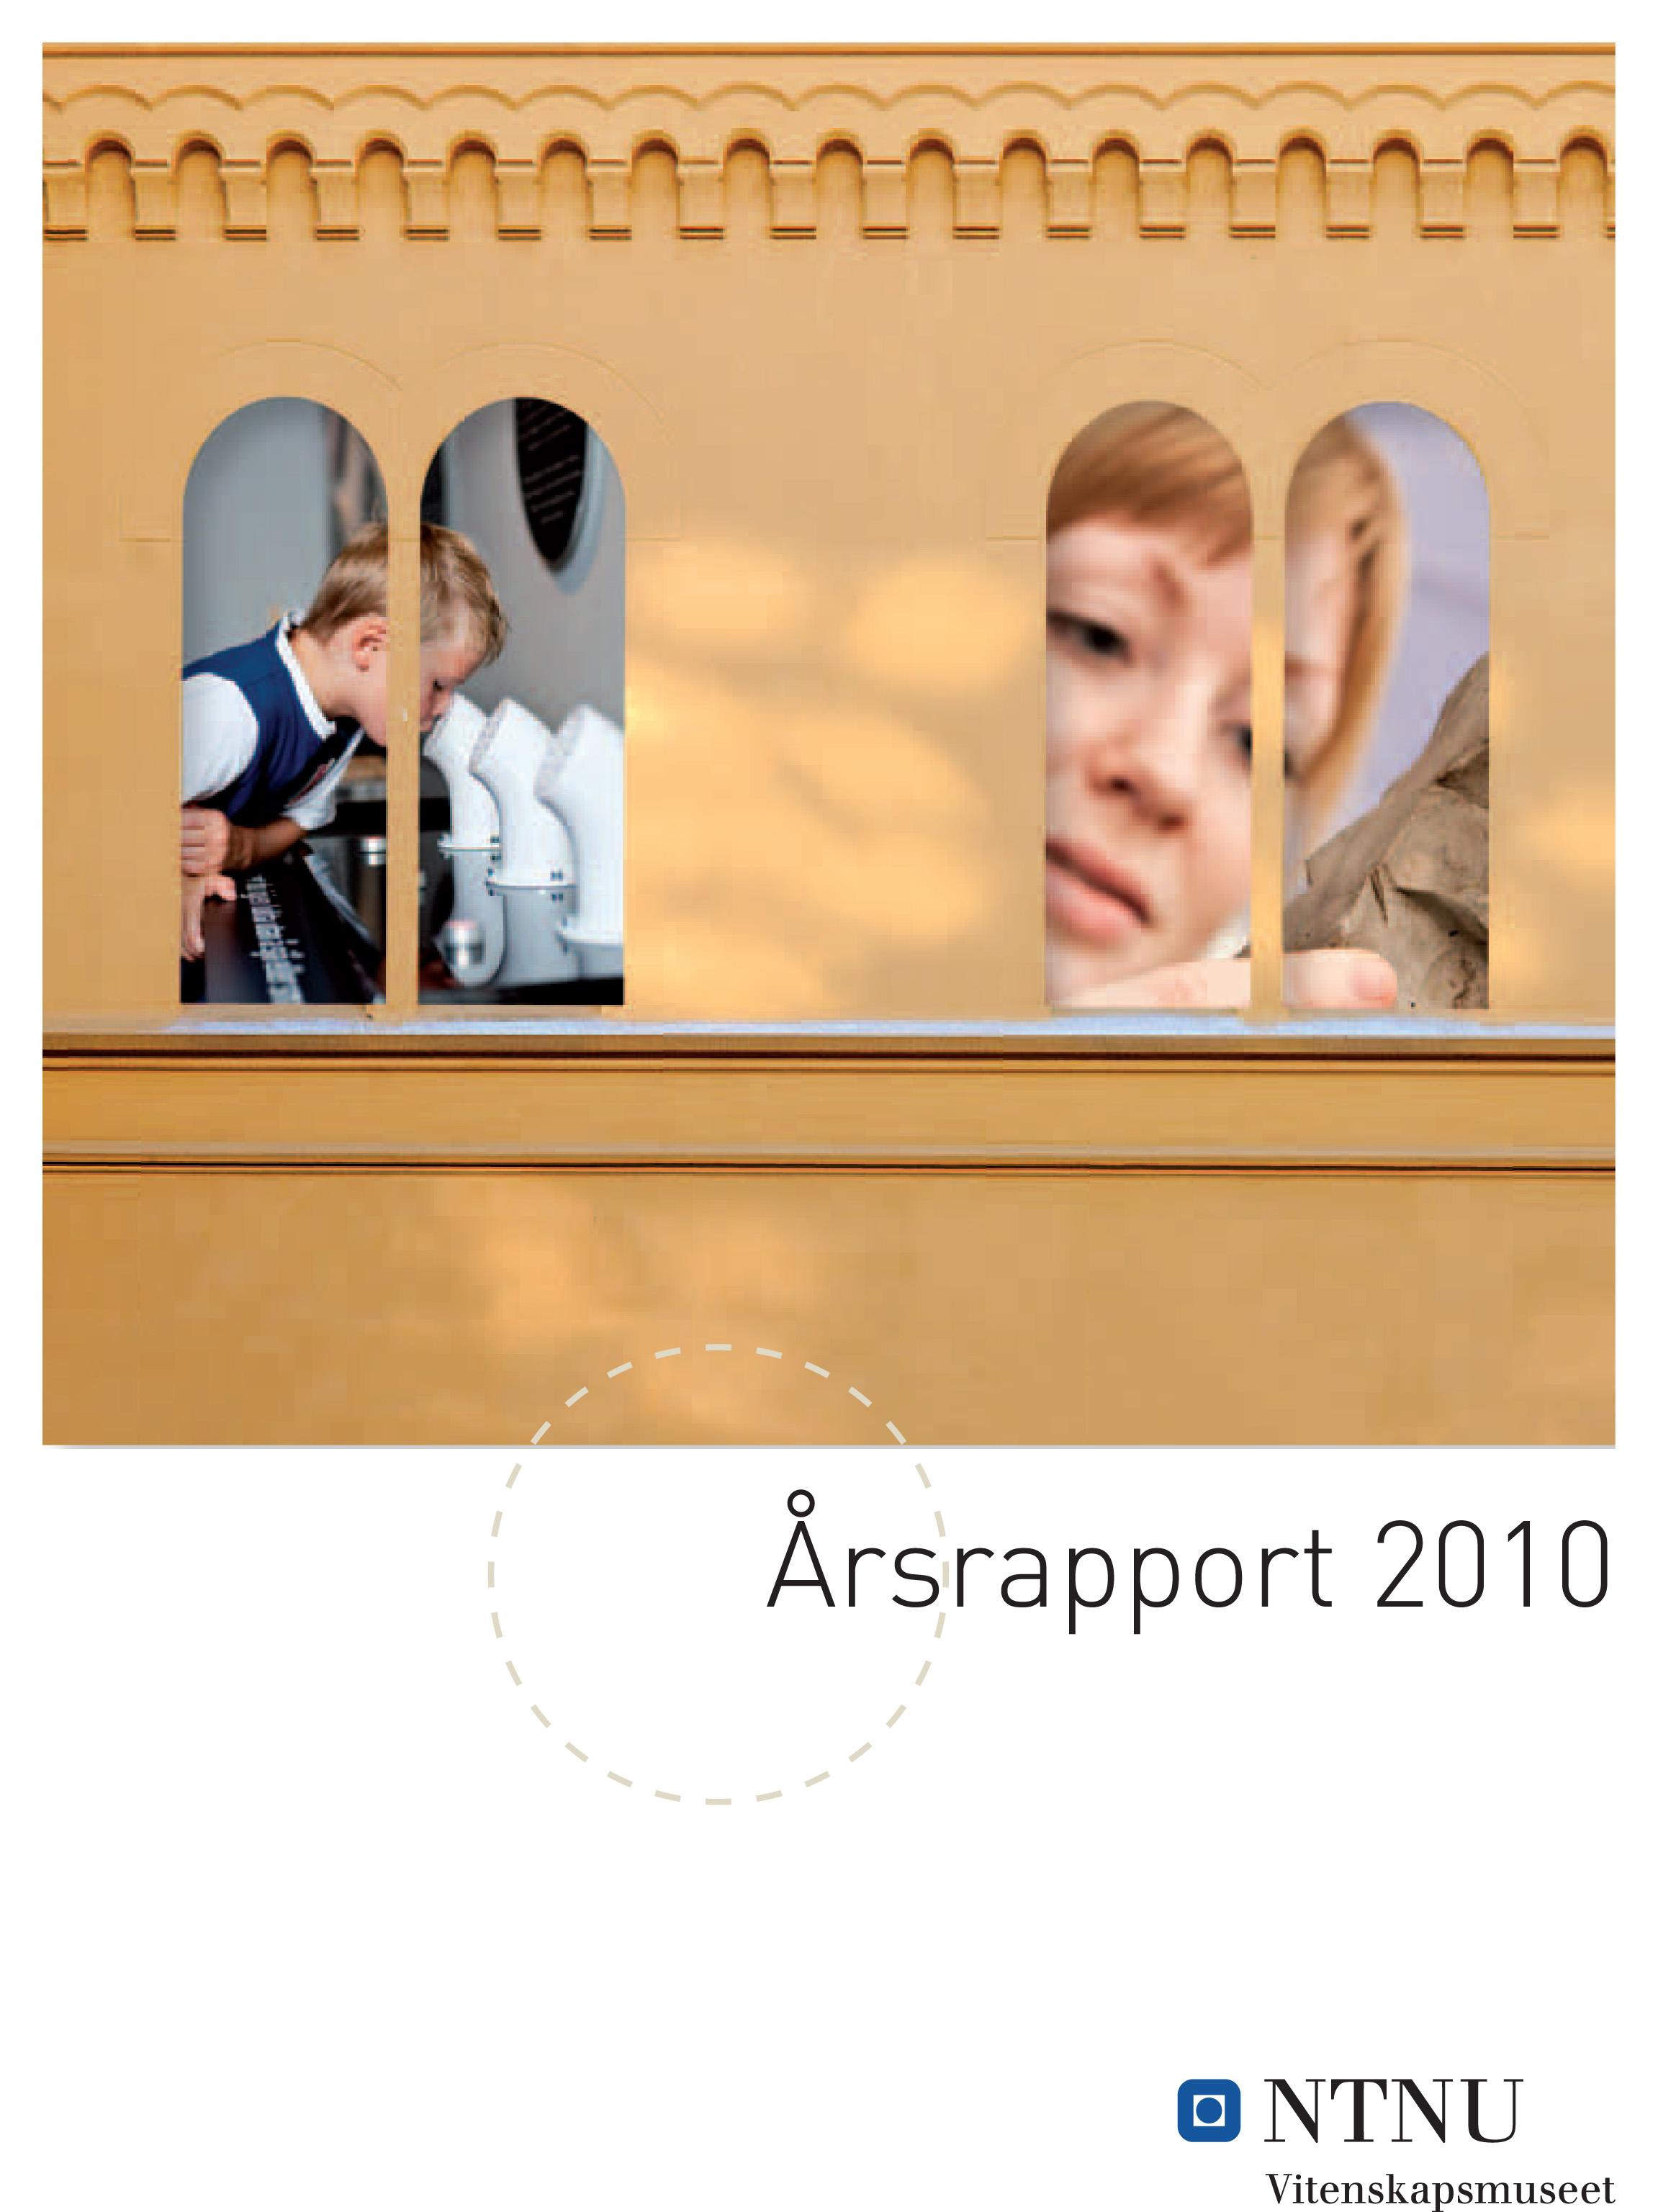 Framside årsrapport 2010